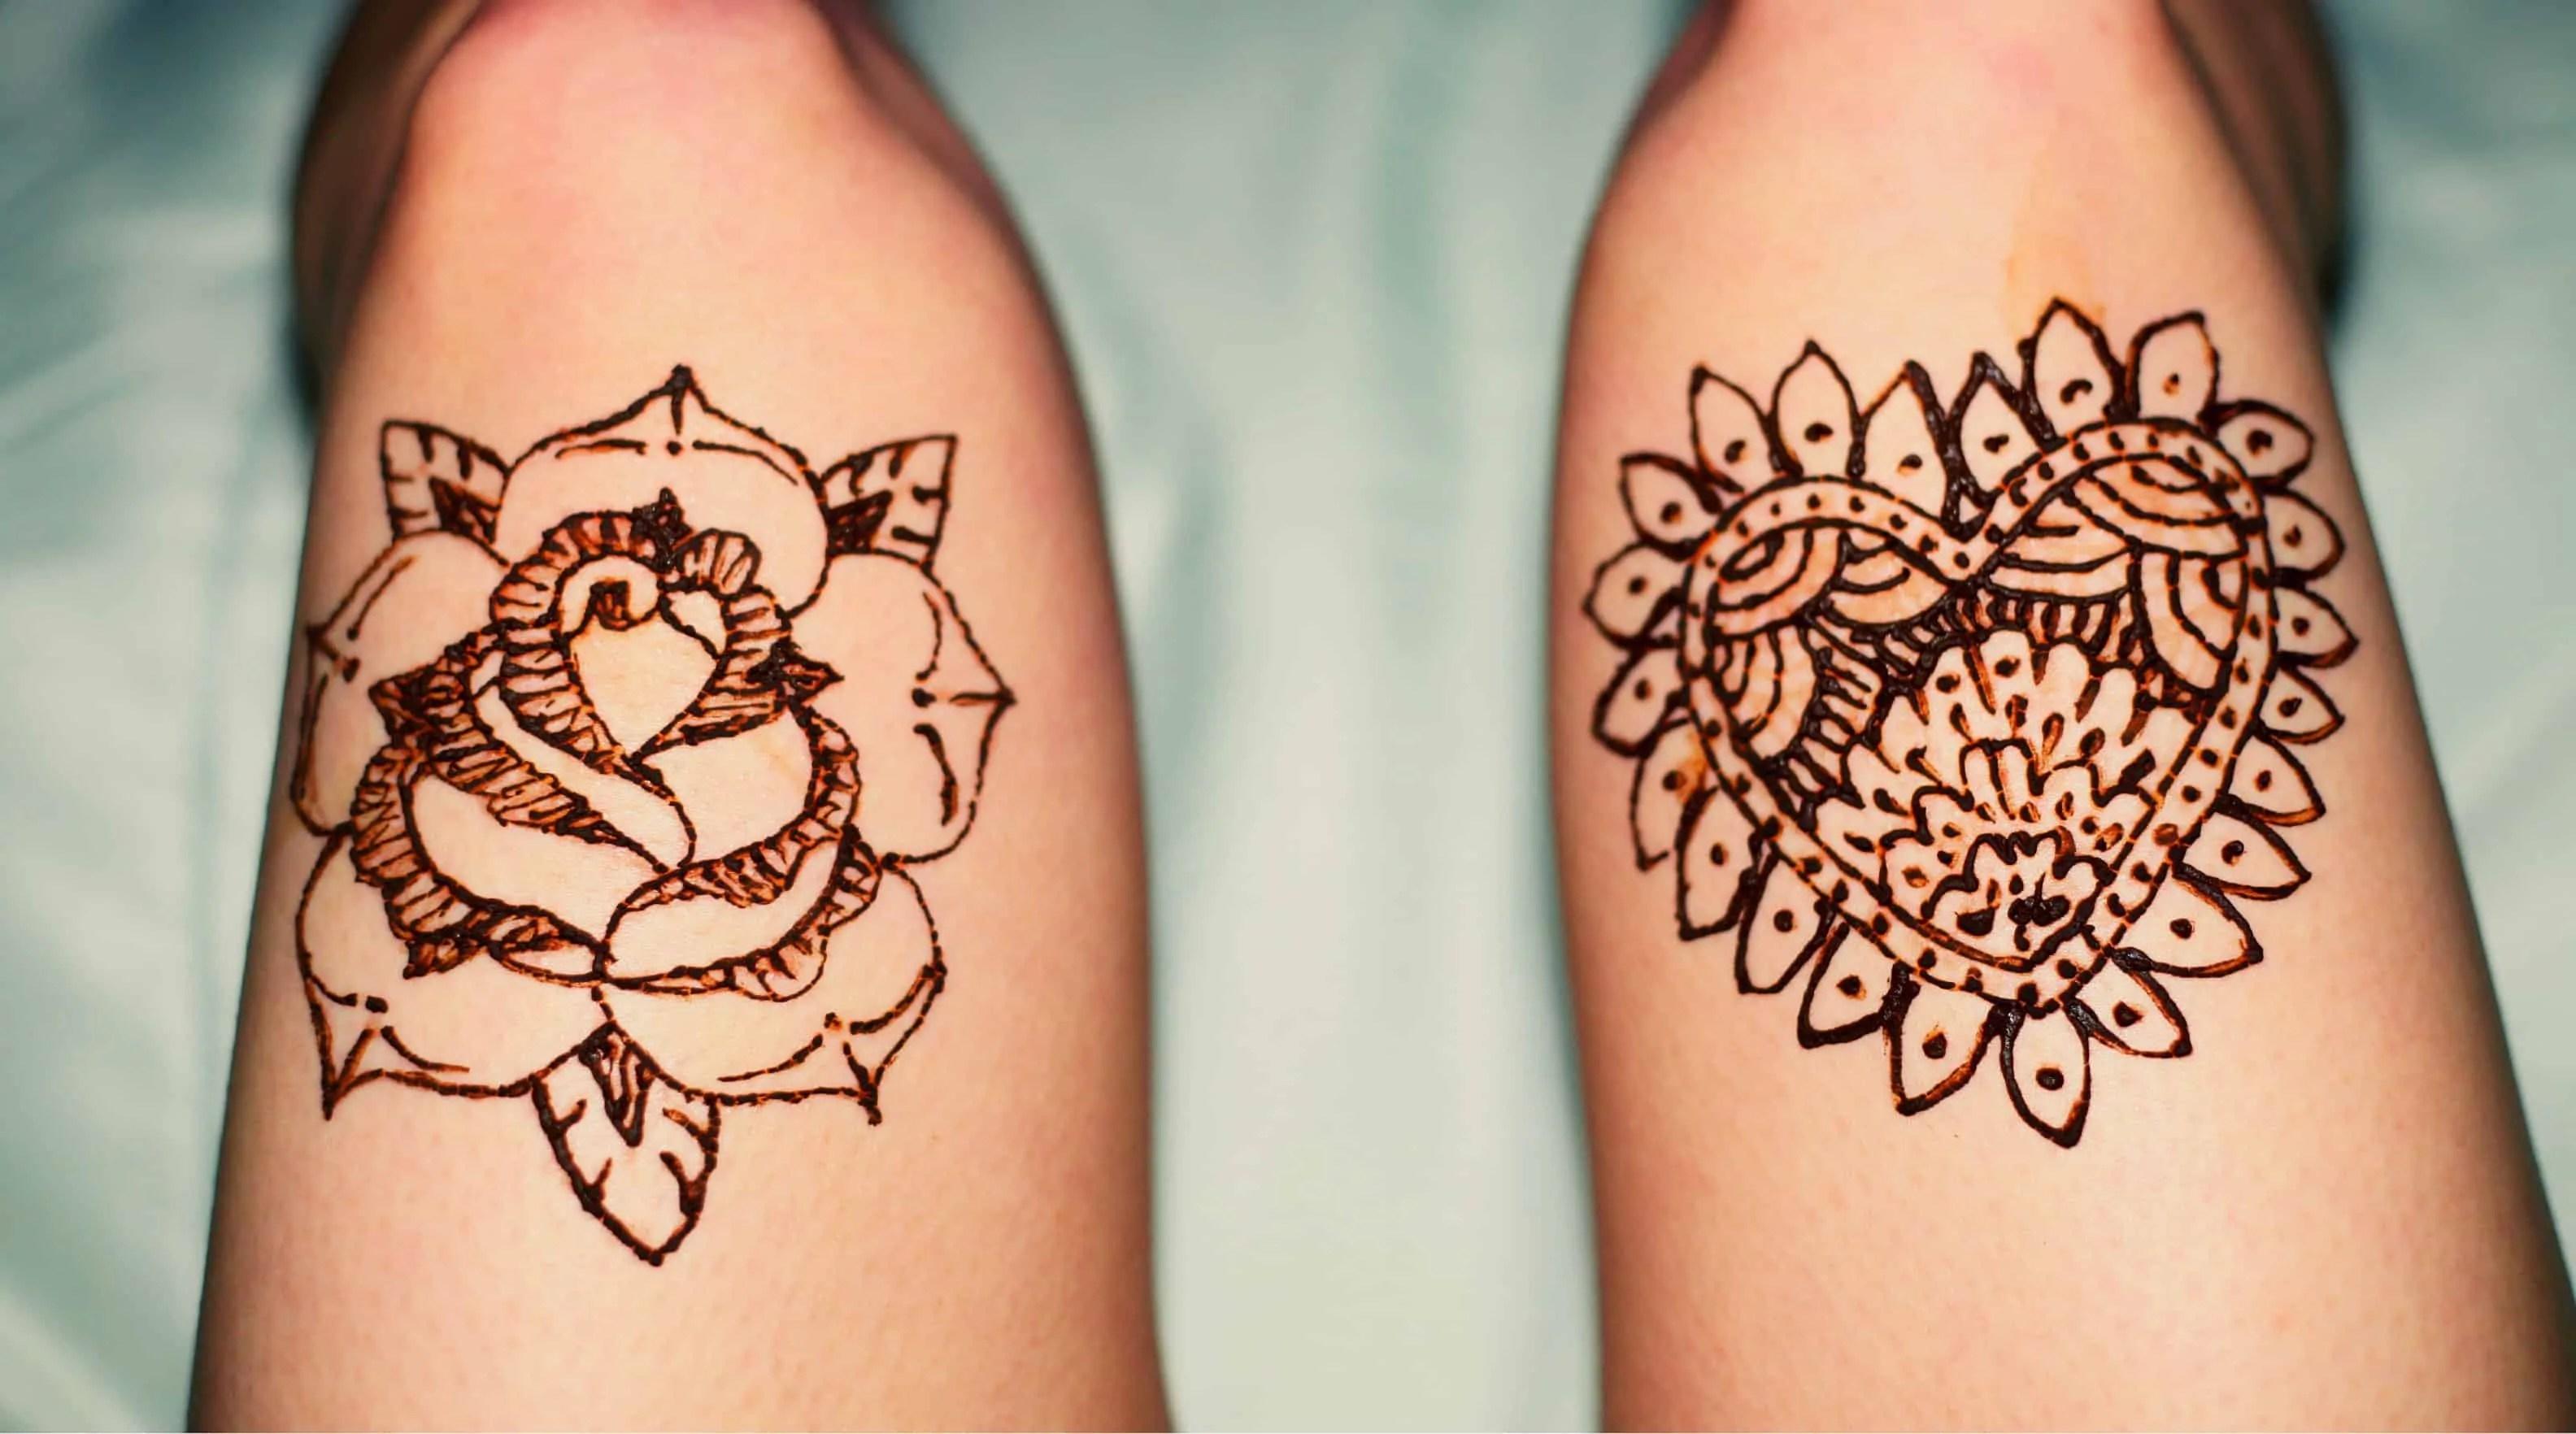 Henna Art Of Roses On Leg Tattoos Spot